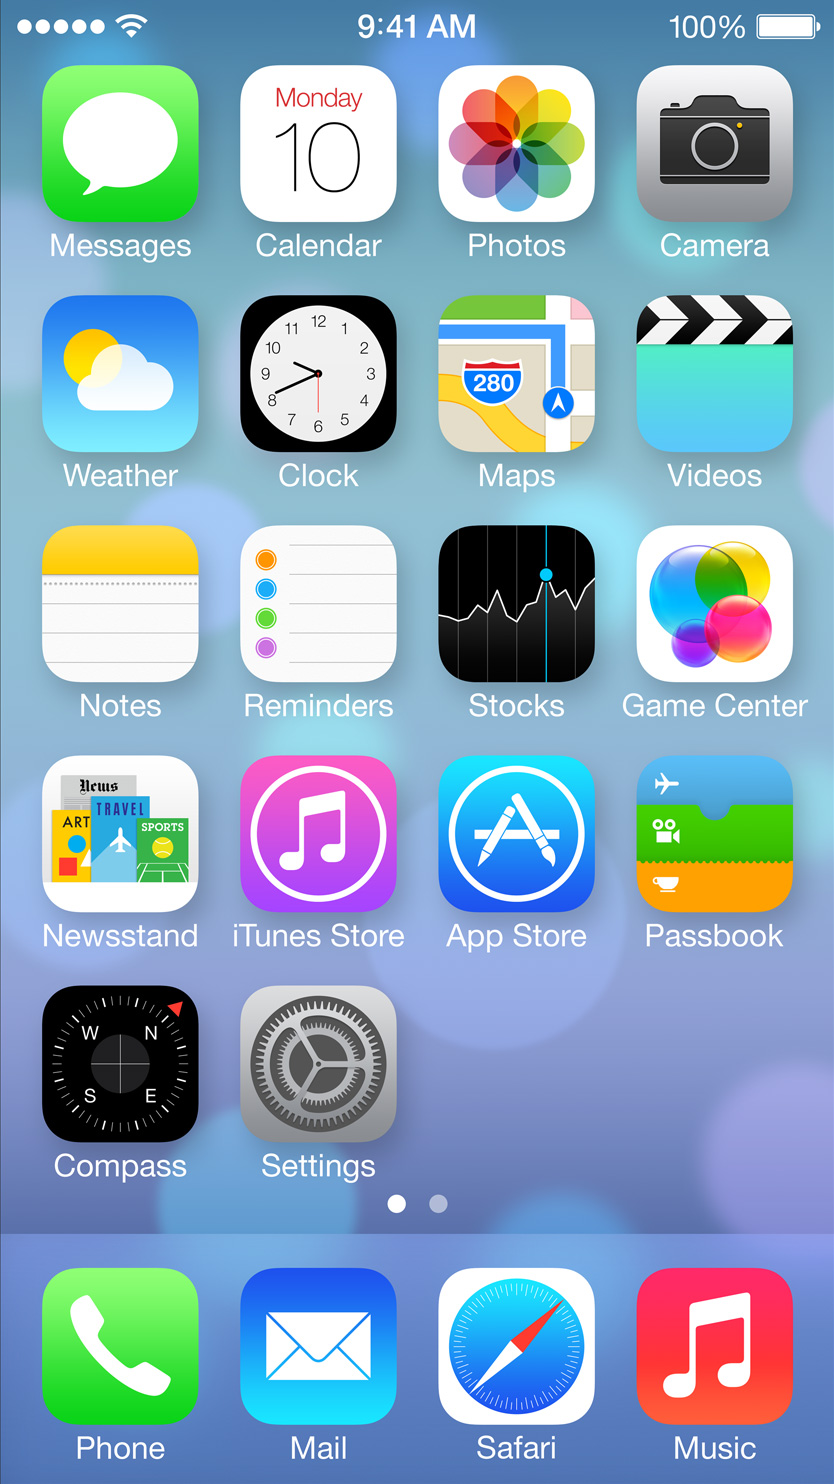 iPhone Home Screen iOS 7